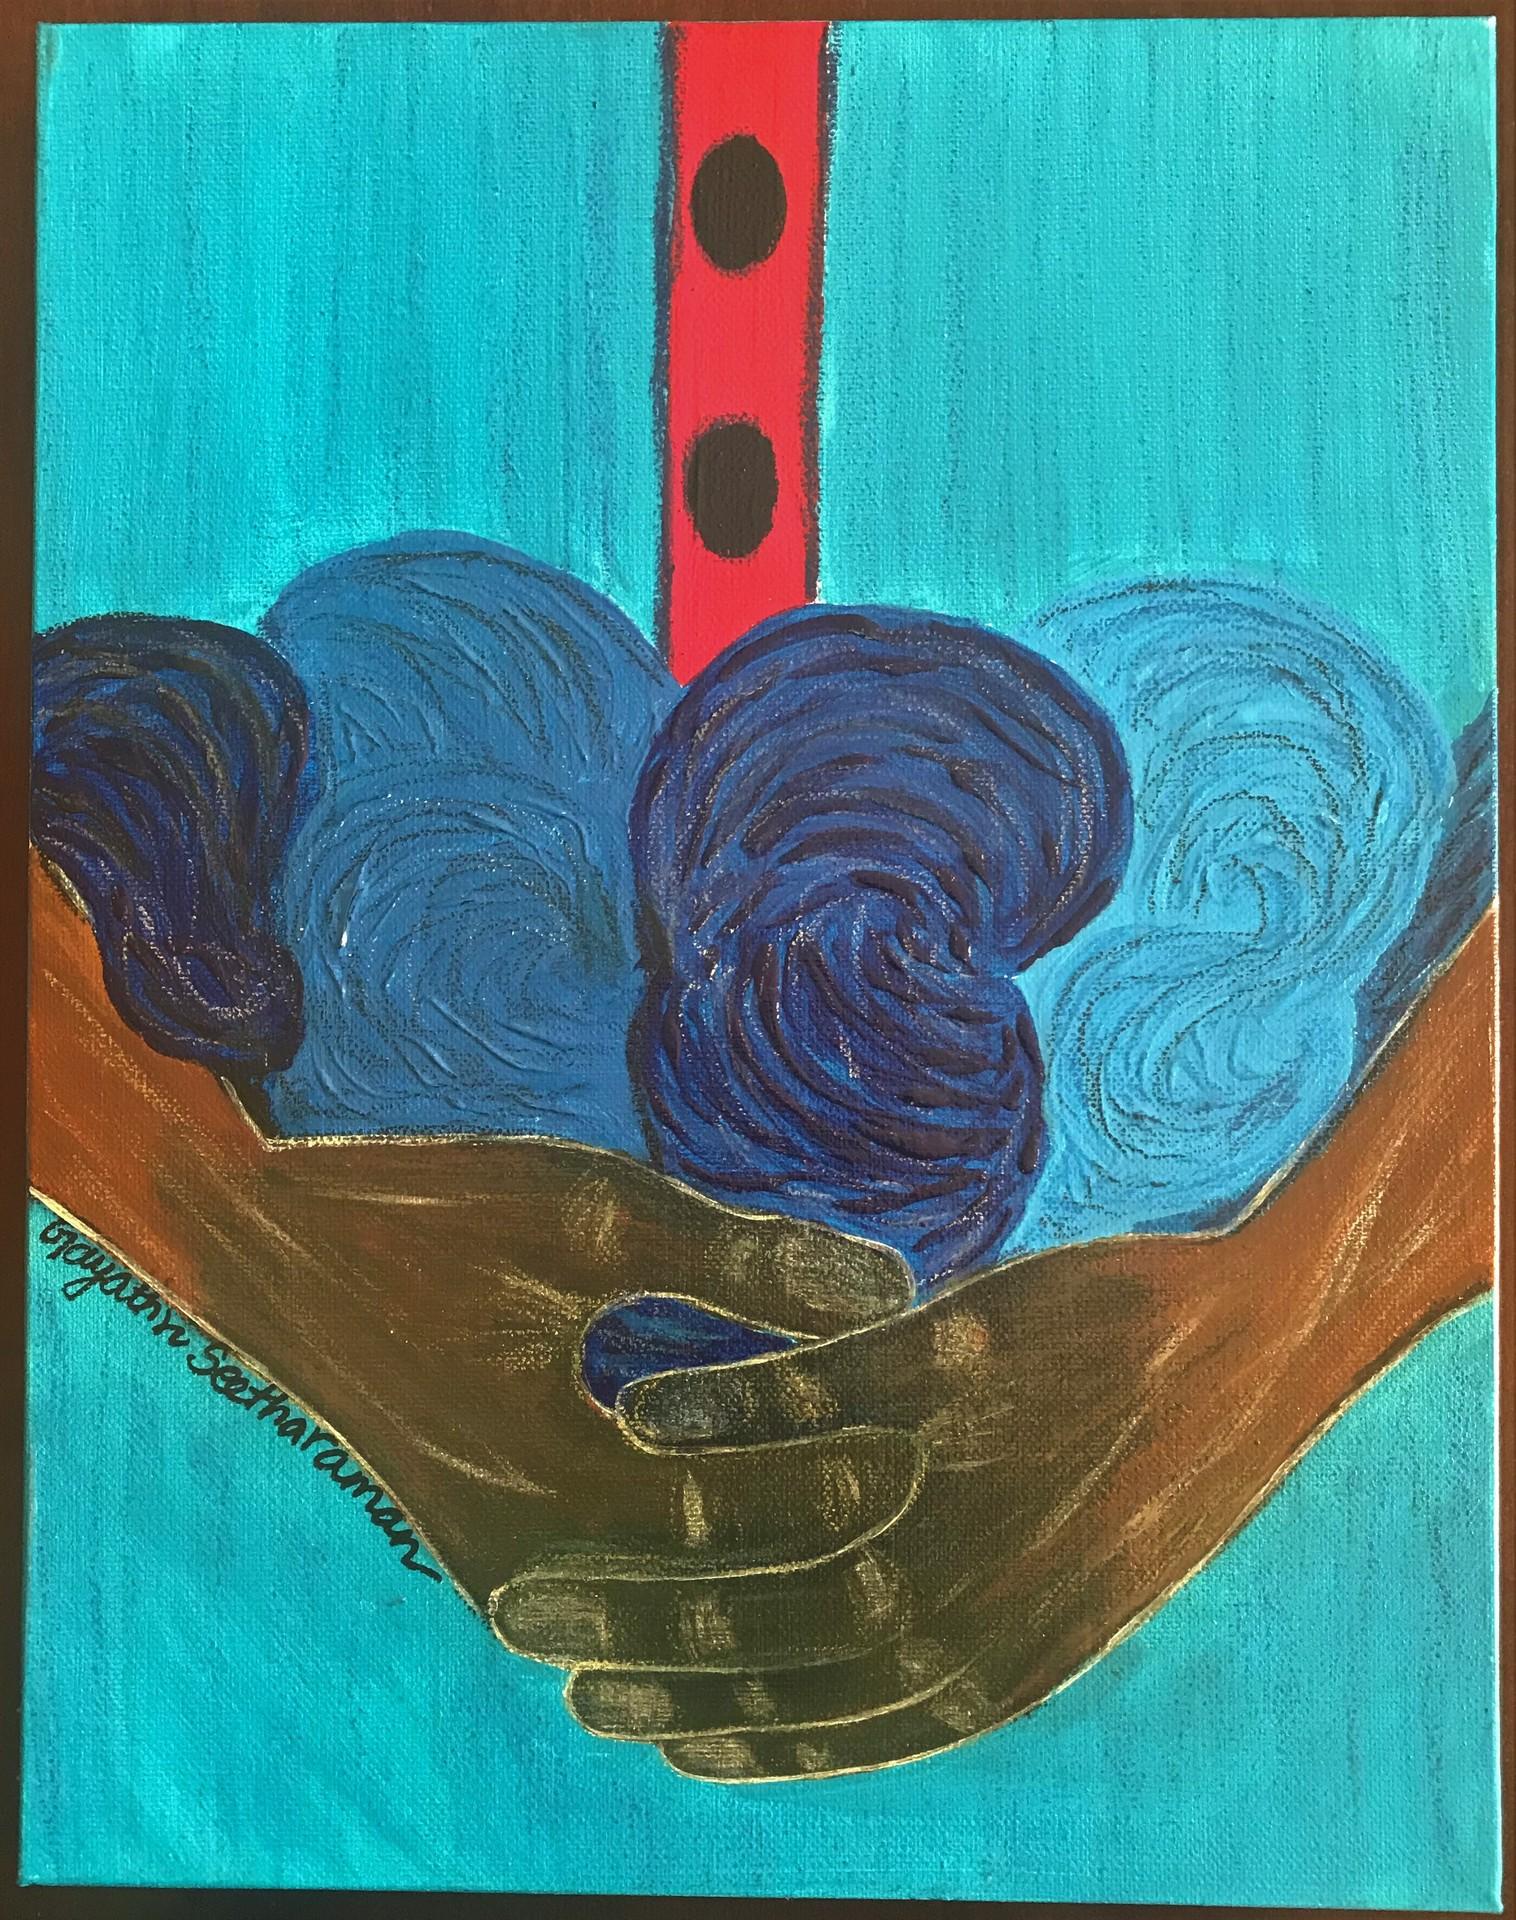 """The Indigo-Blue Maker series - Threads"" Gayathri Seetharaman"